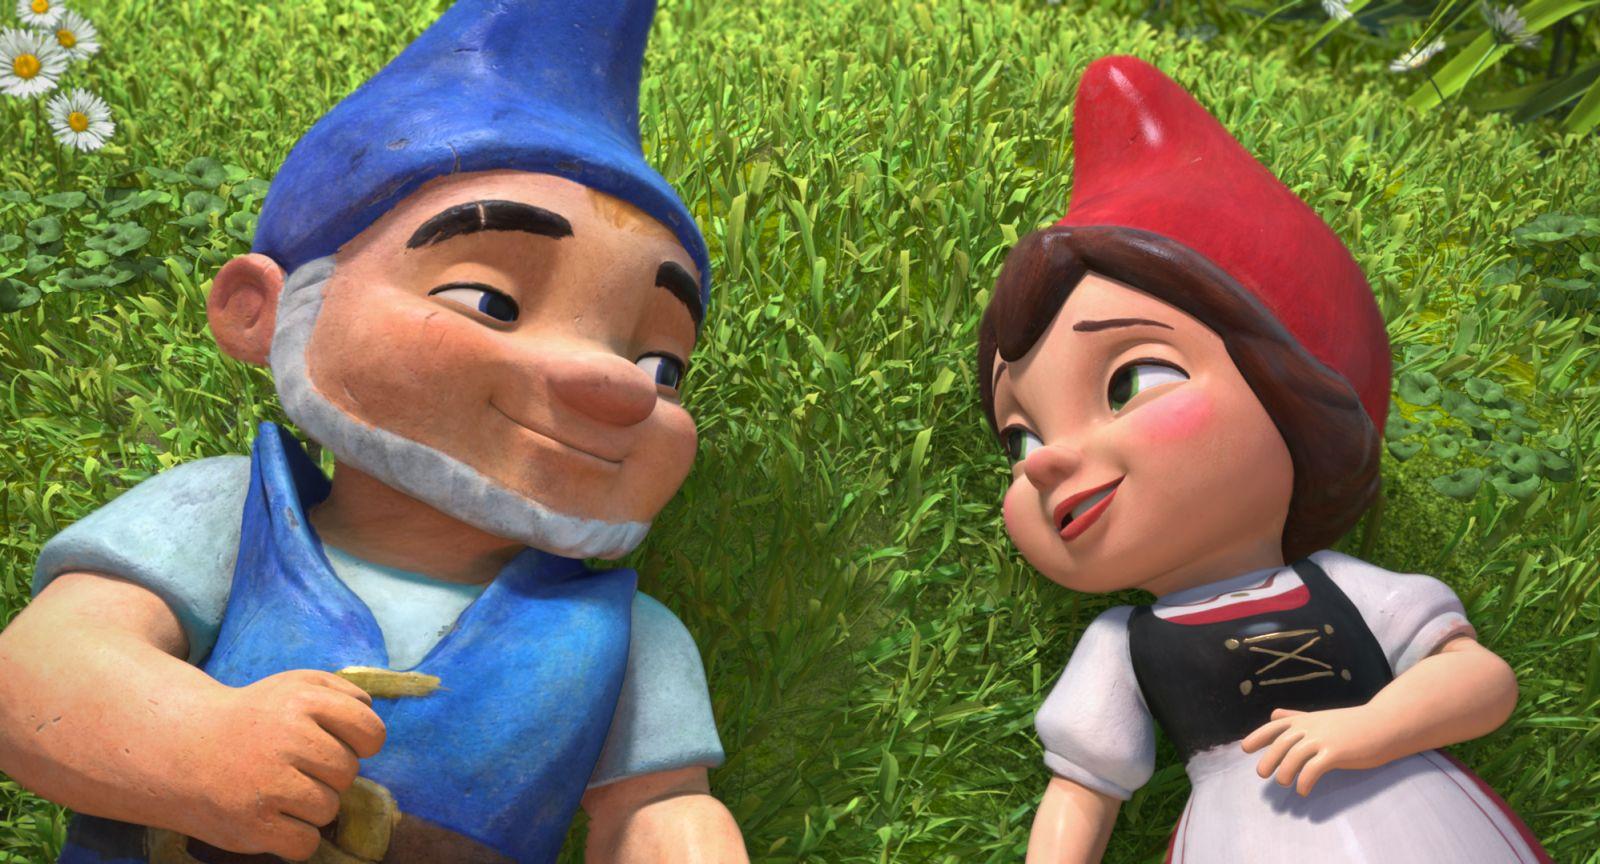 James Mcavoy Gnomeo And Juliet 'Gnomeo & J...